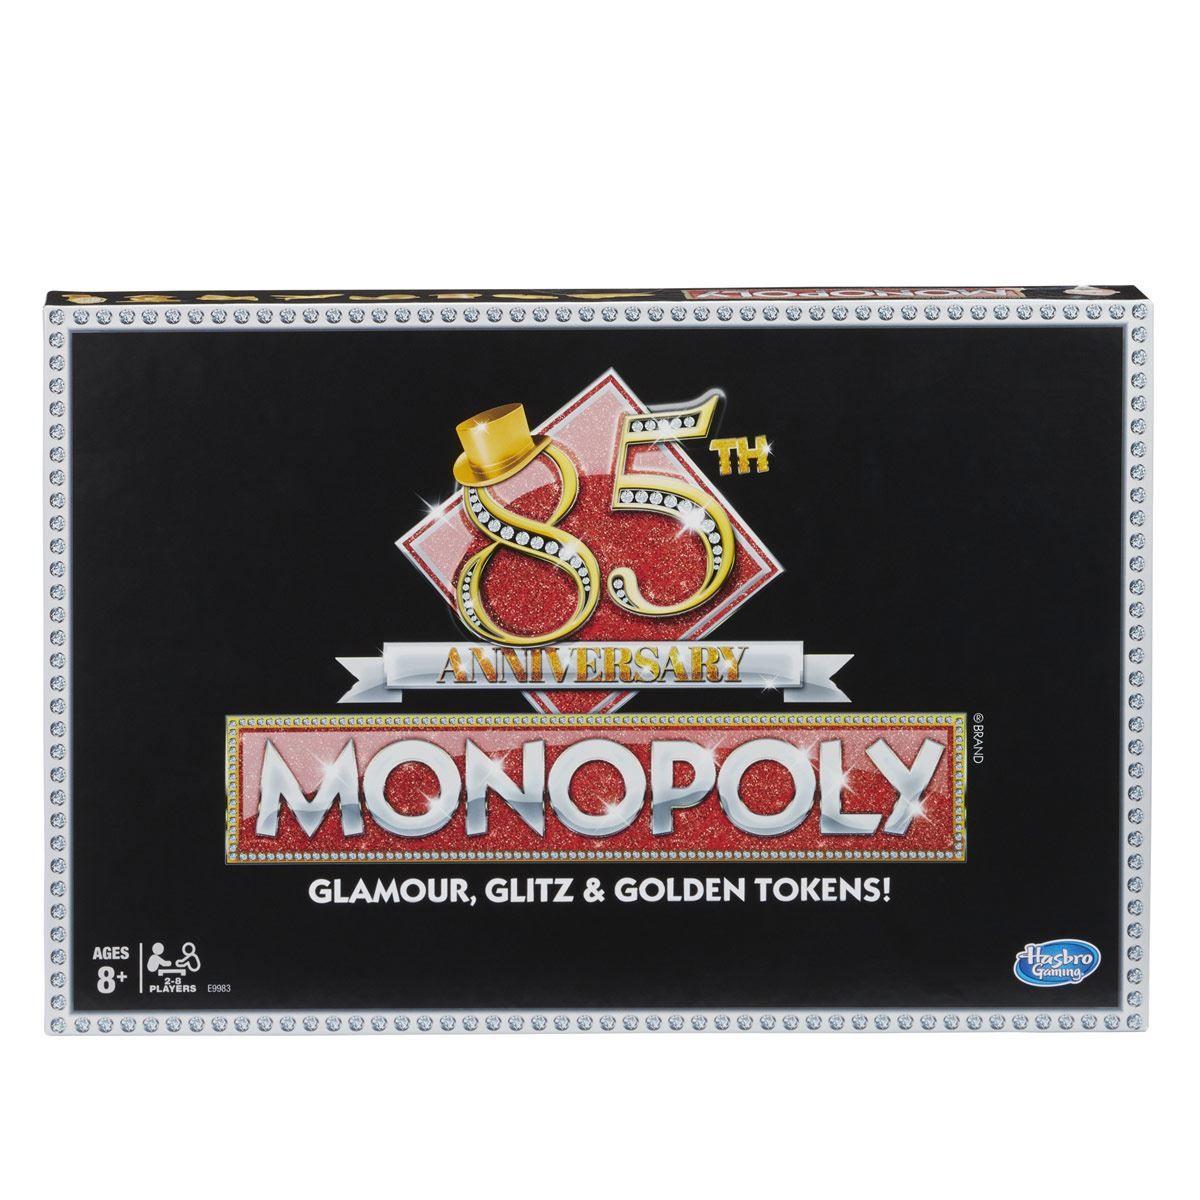 Bodega Aurrera: Monopoly 85 Aniversario